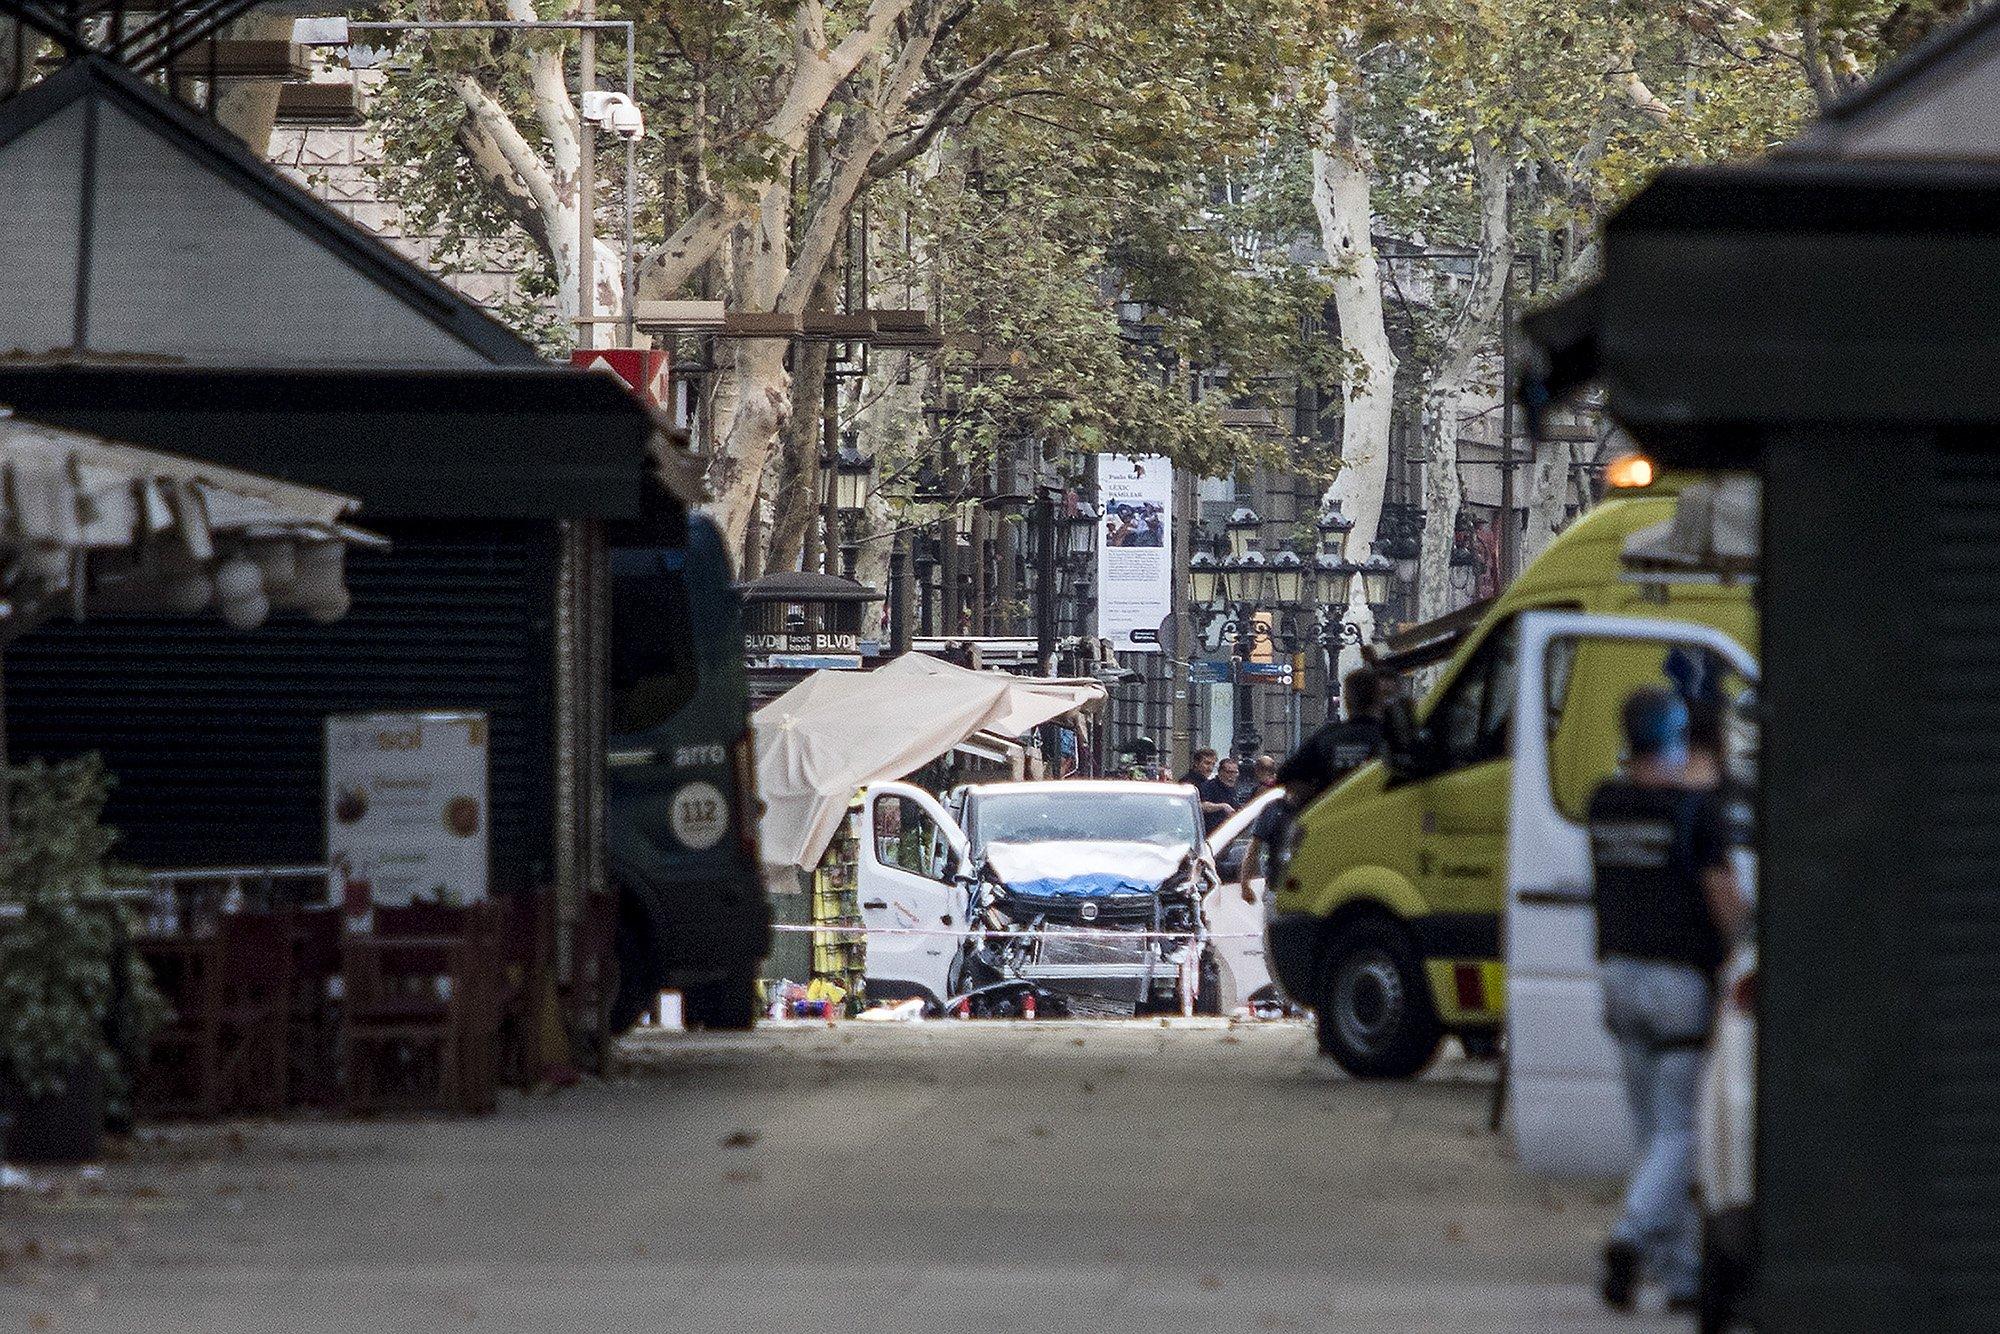 Barcelona terror attack leader was an informer for Spanish intelligence till the end